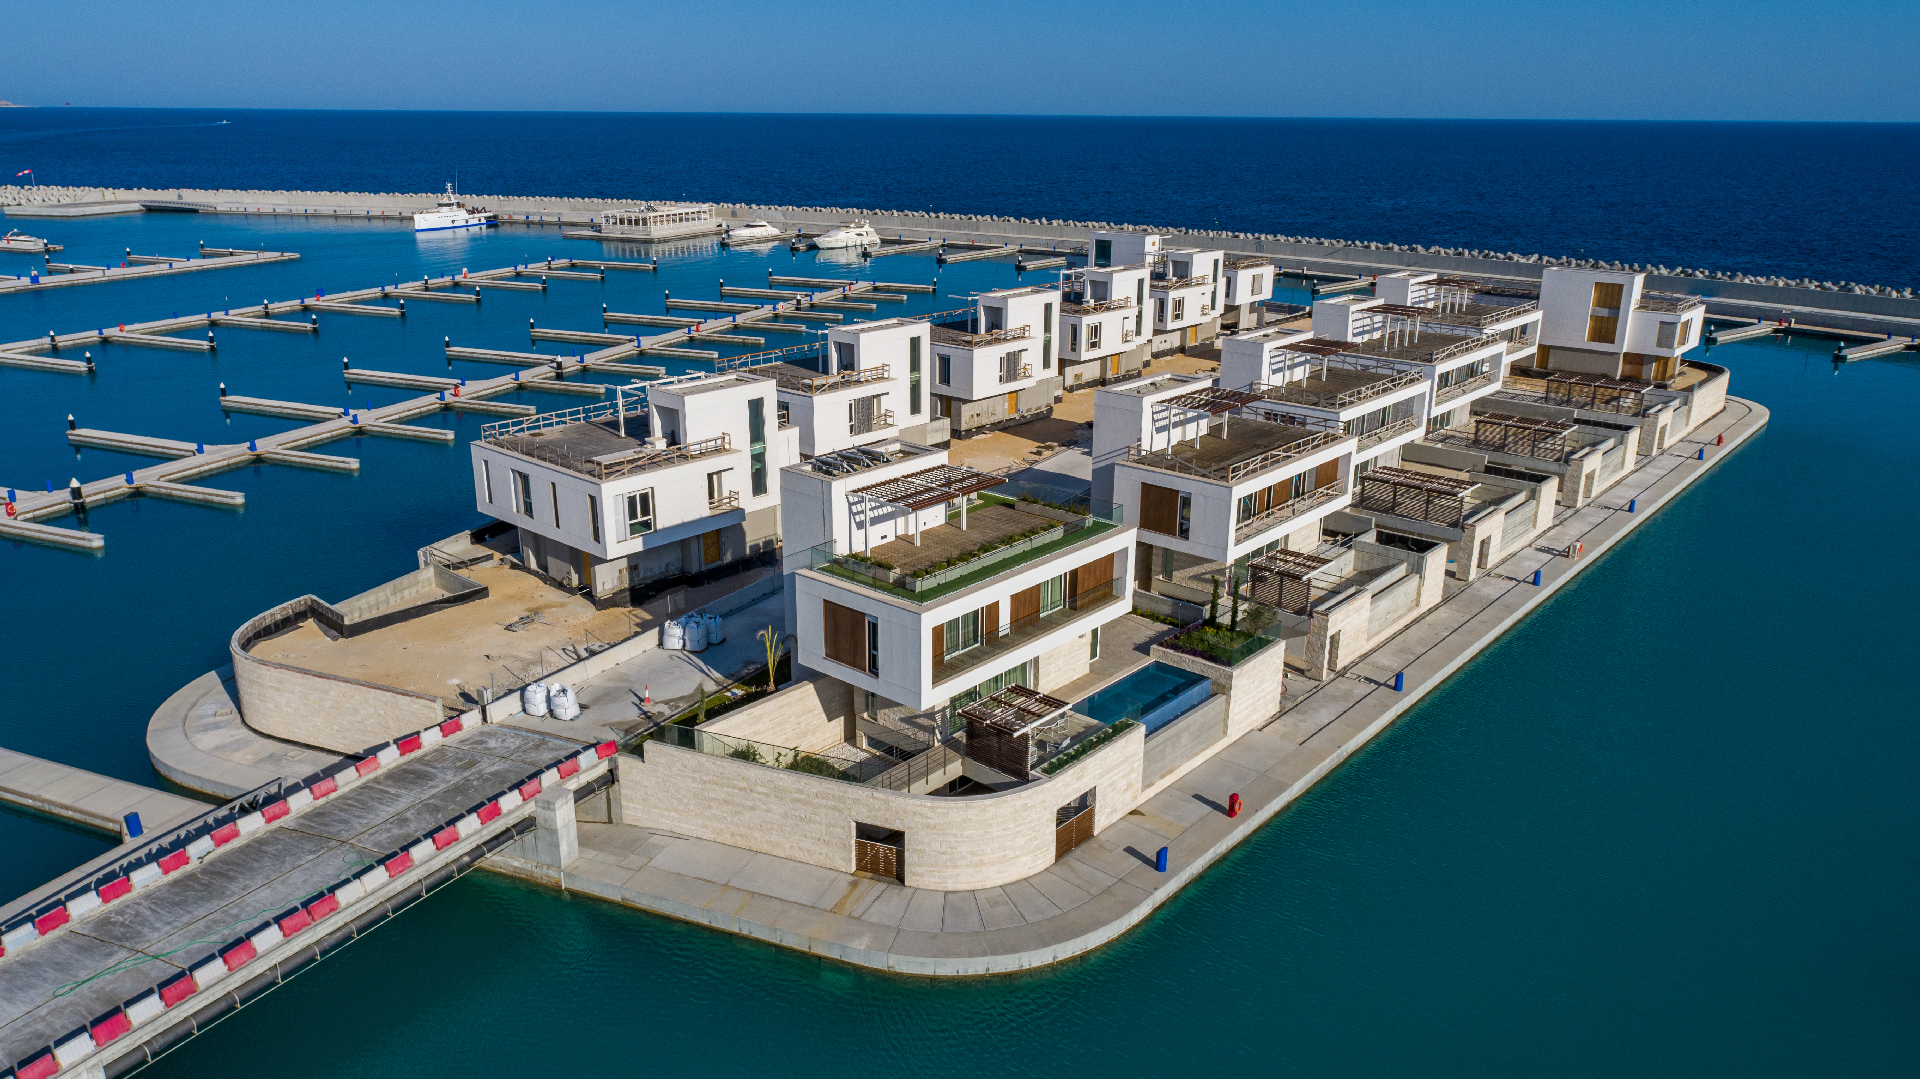 Ayia Napa Marina - Island Villas